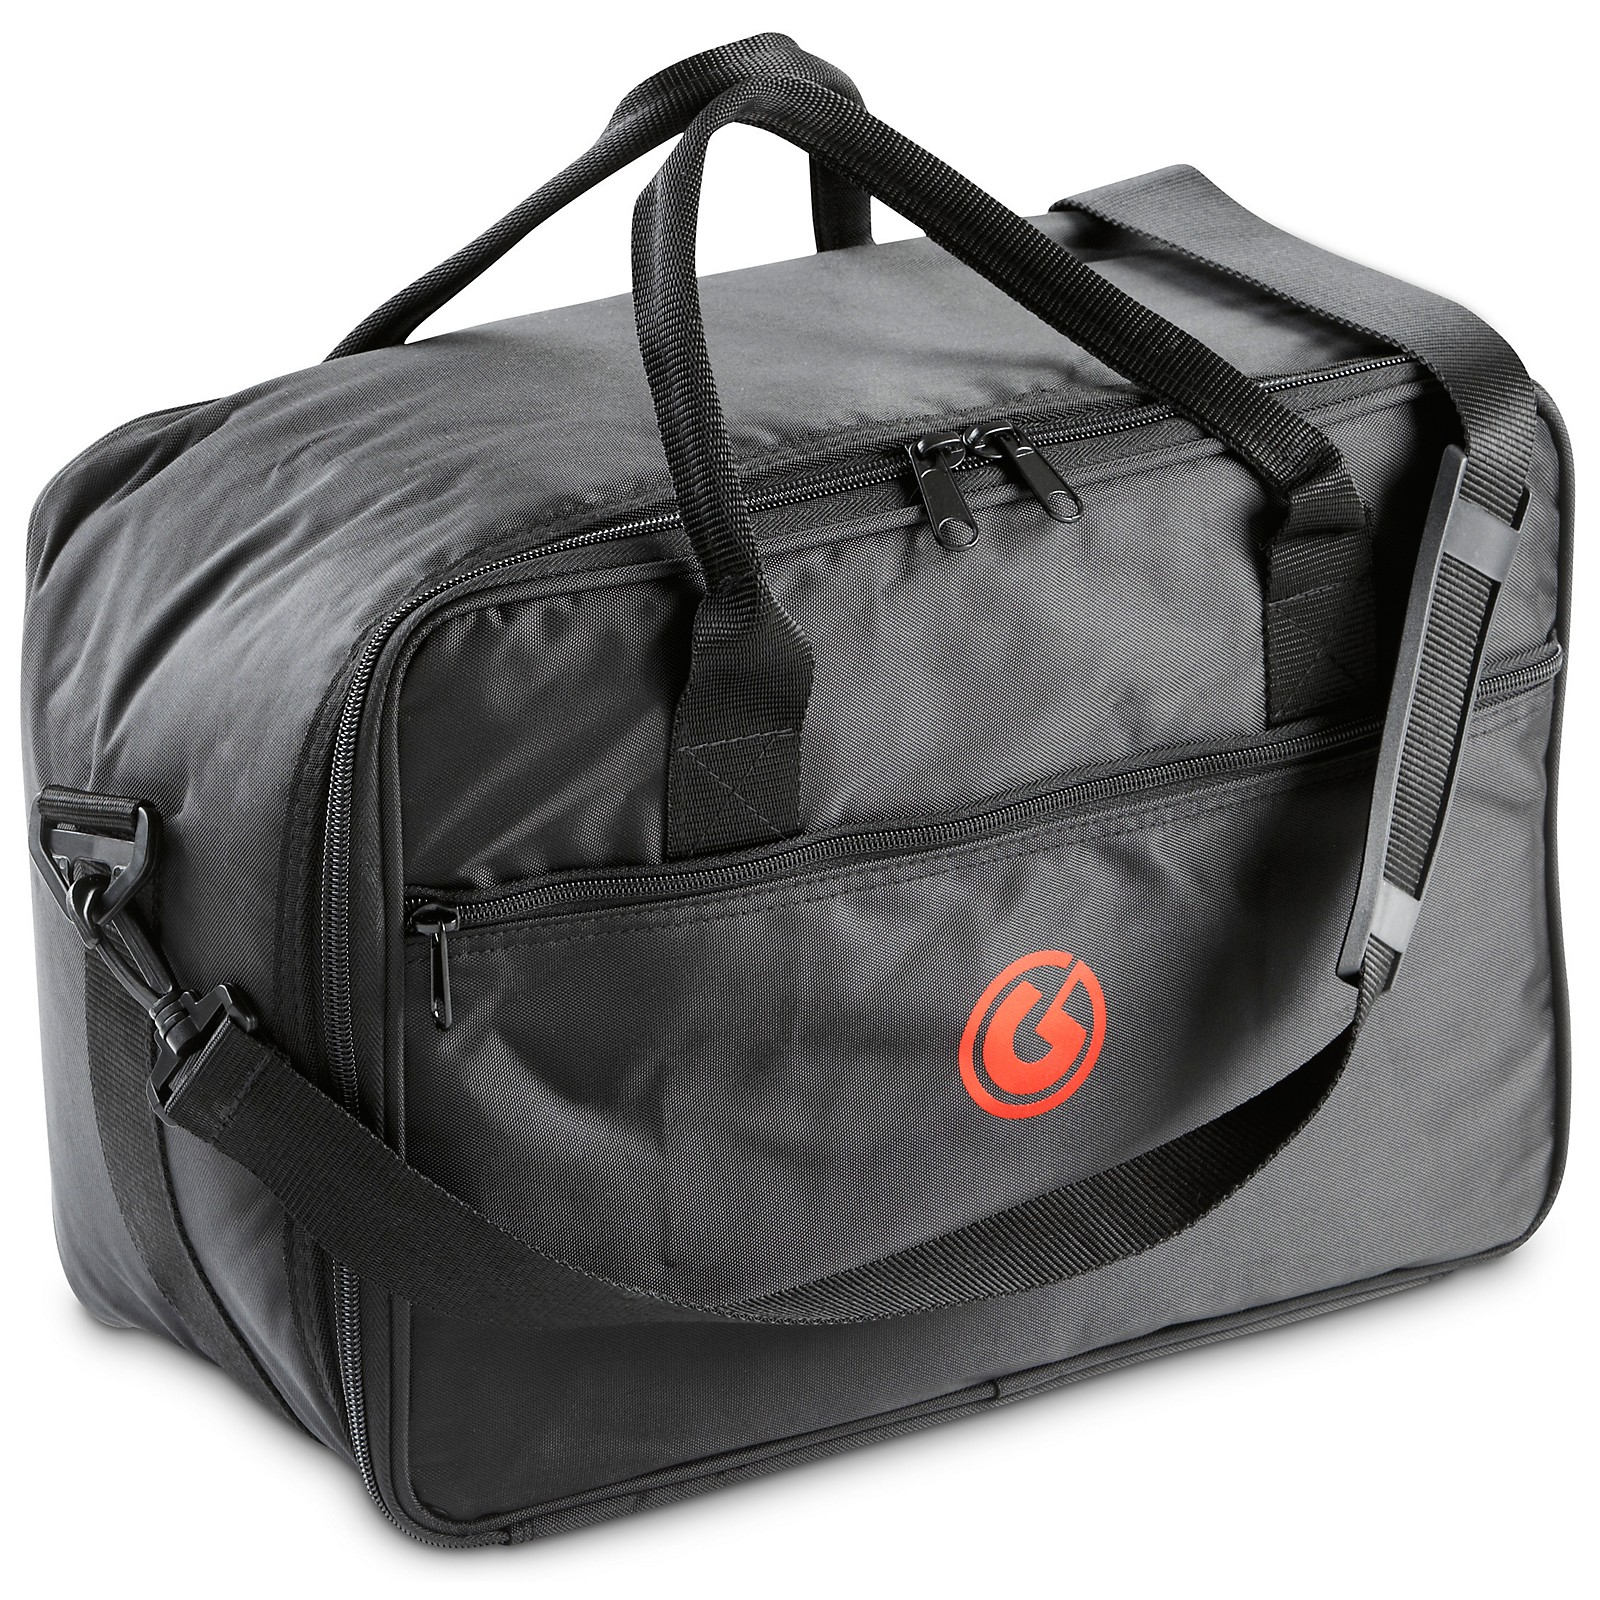 Gibraltar Double-Pedal Carry Bag